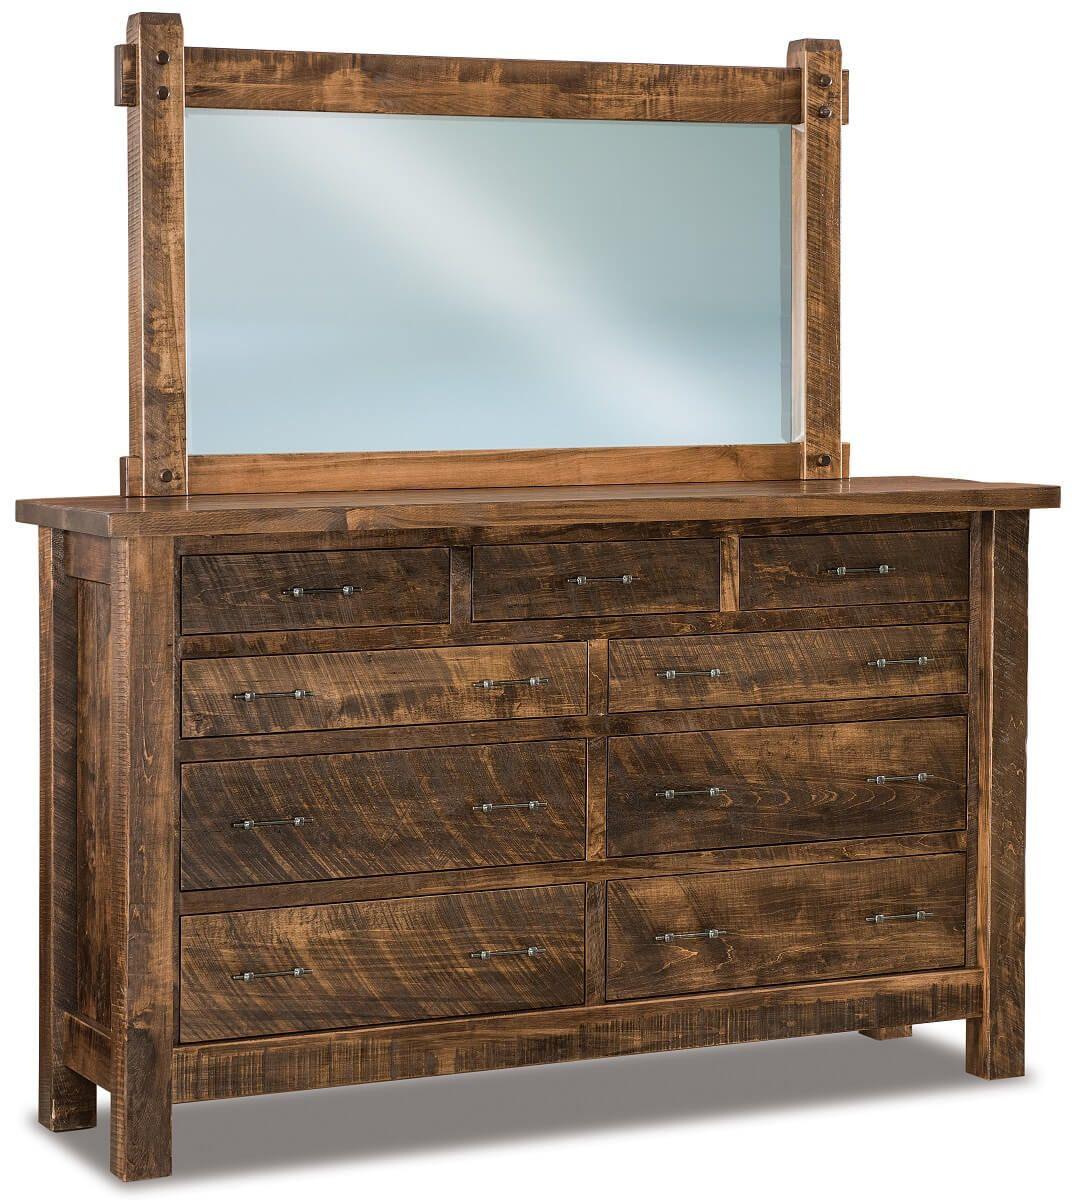 Brinkley Grand Dresser